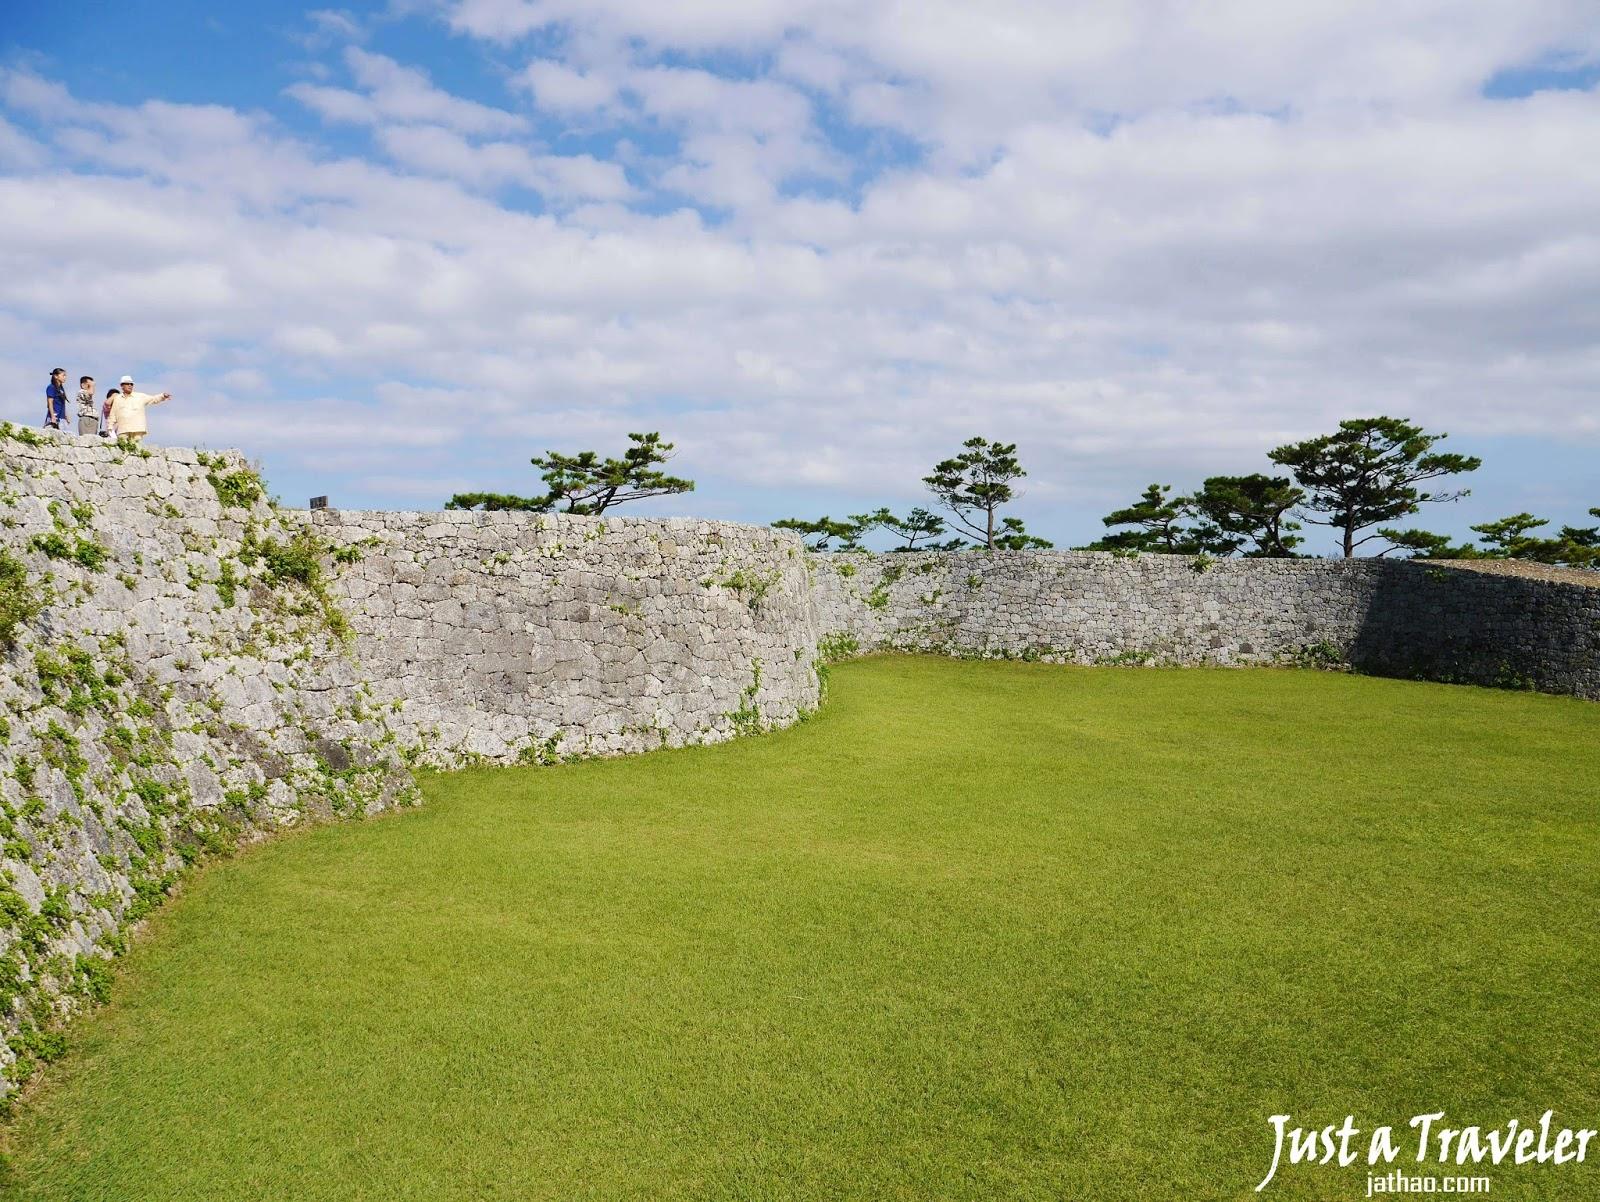 沖繩-世界遺產-座喜味城跡-Zakimijo-ato-自由行-旅遊-景點-Okinawa-world-heritage